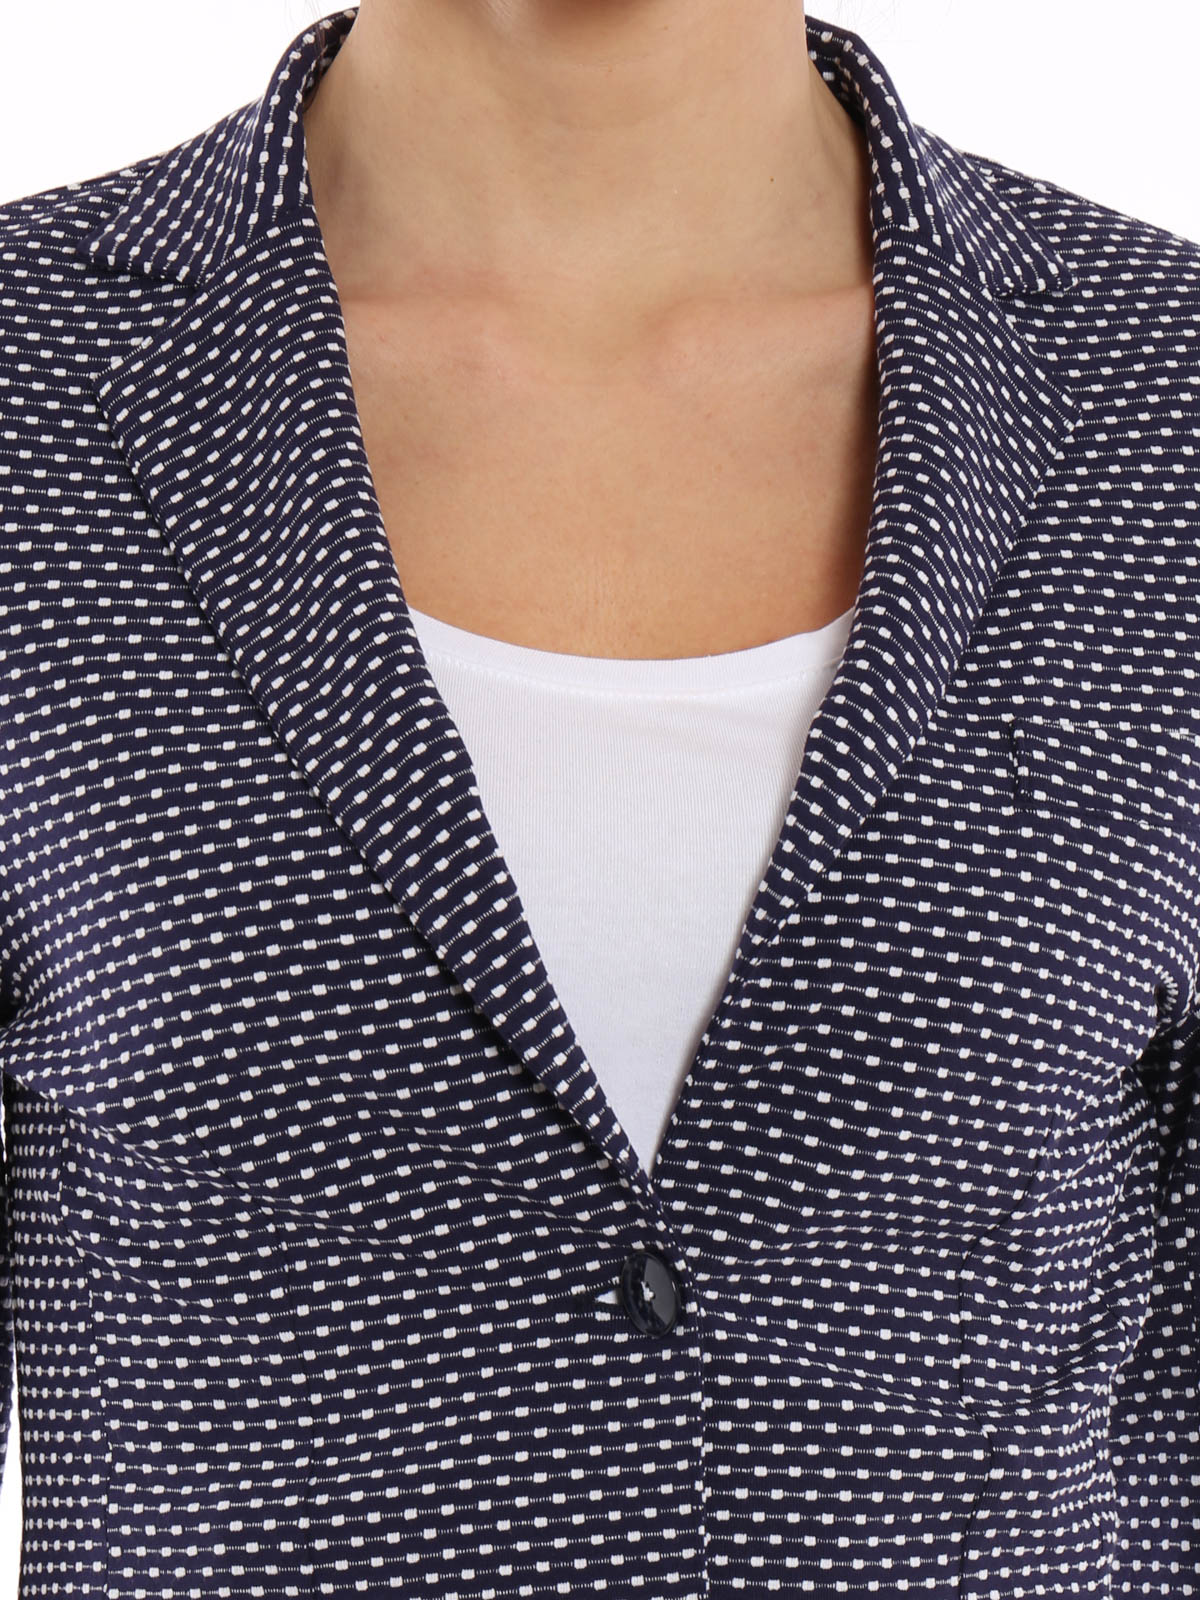 Circolo 1901 Blazer sartoriale con micro motivo giacche